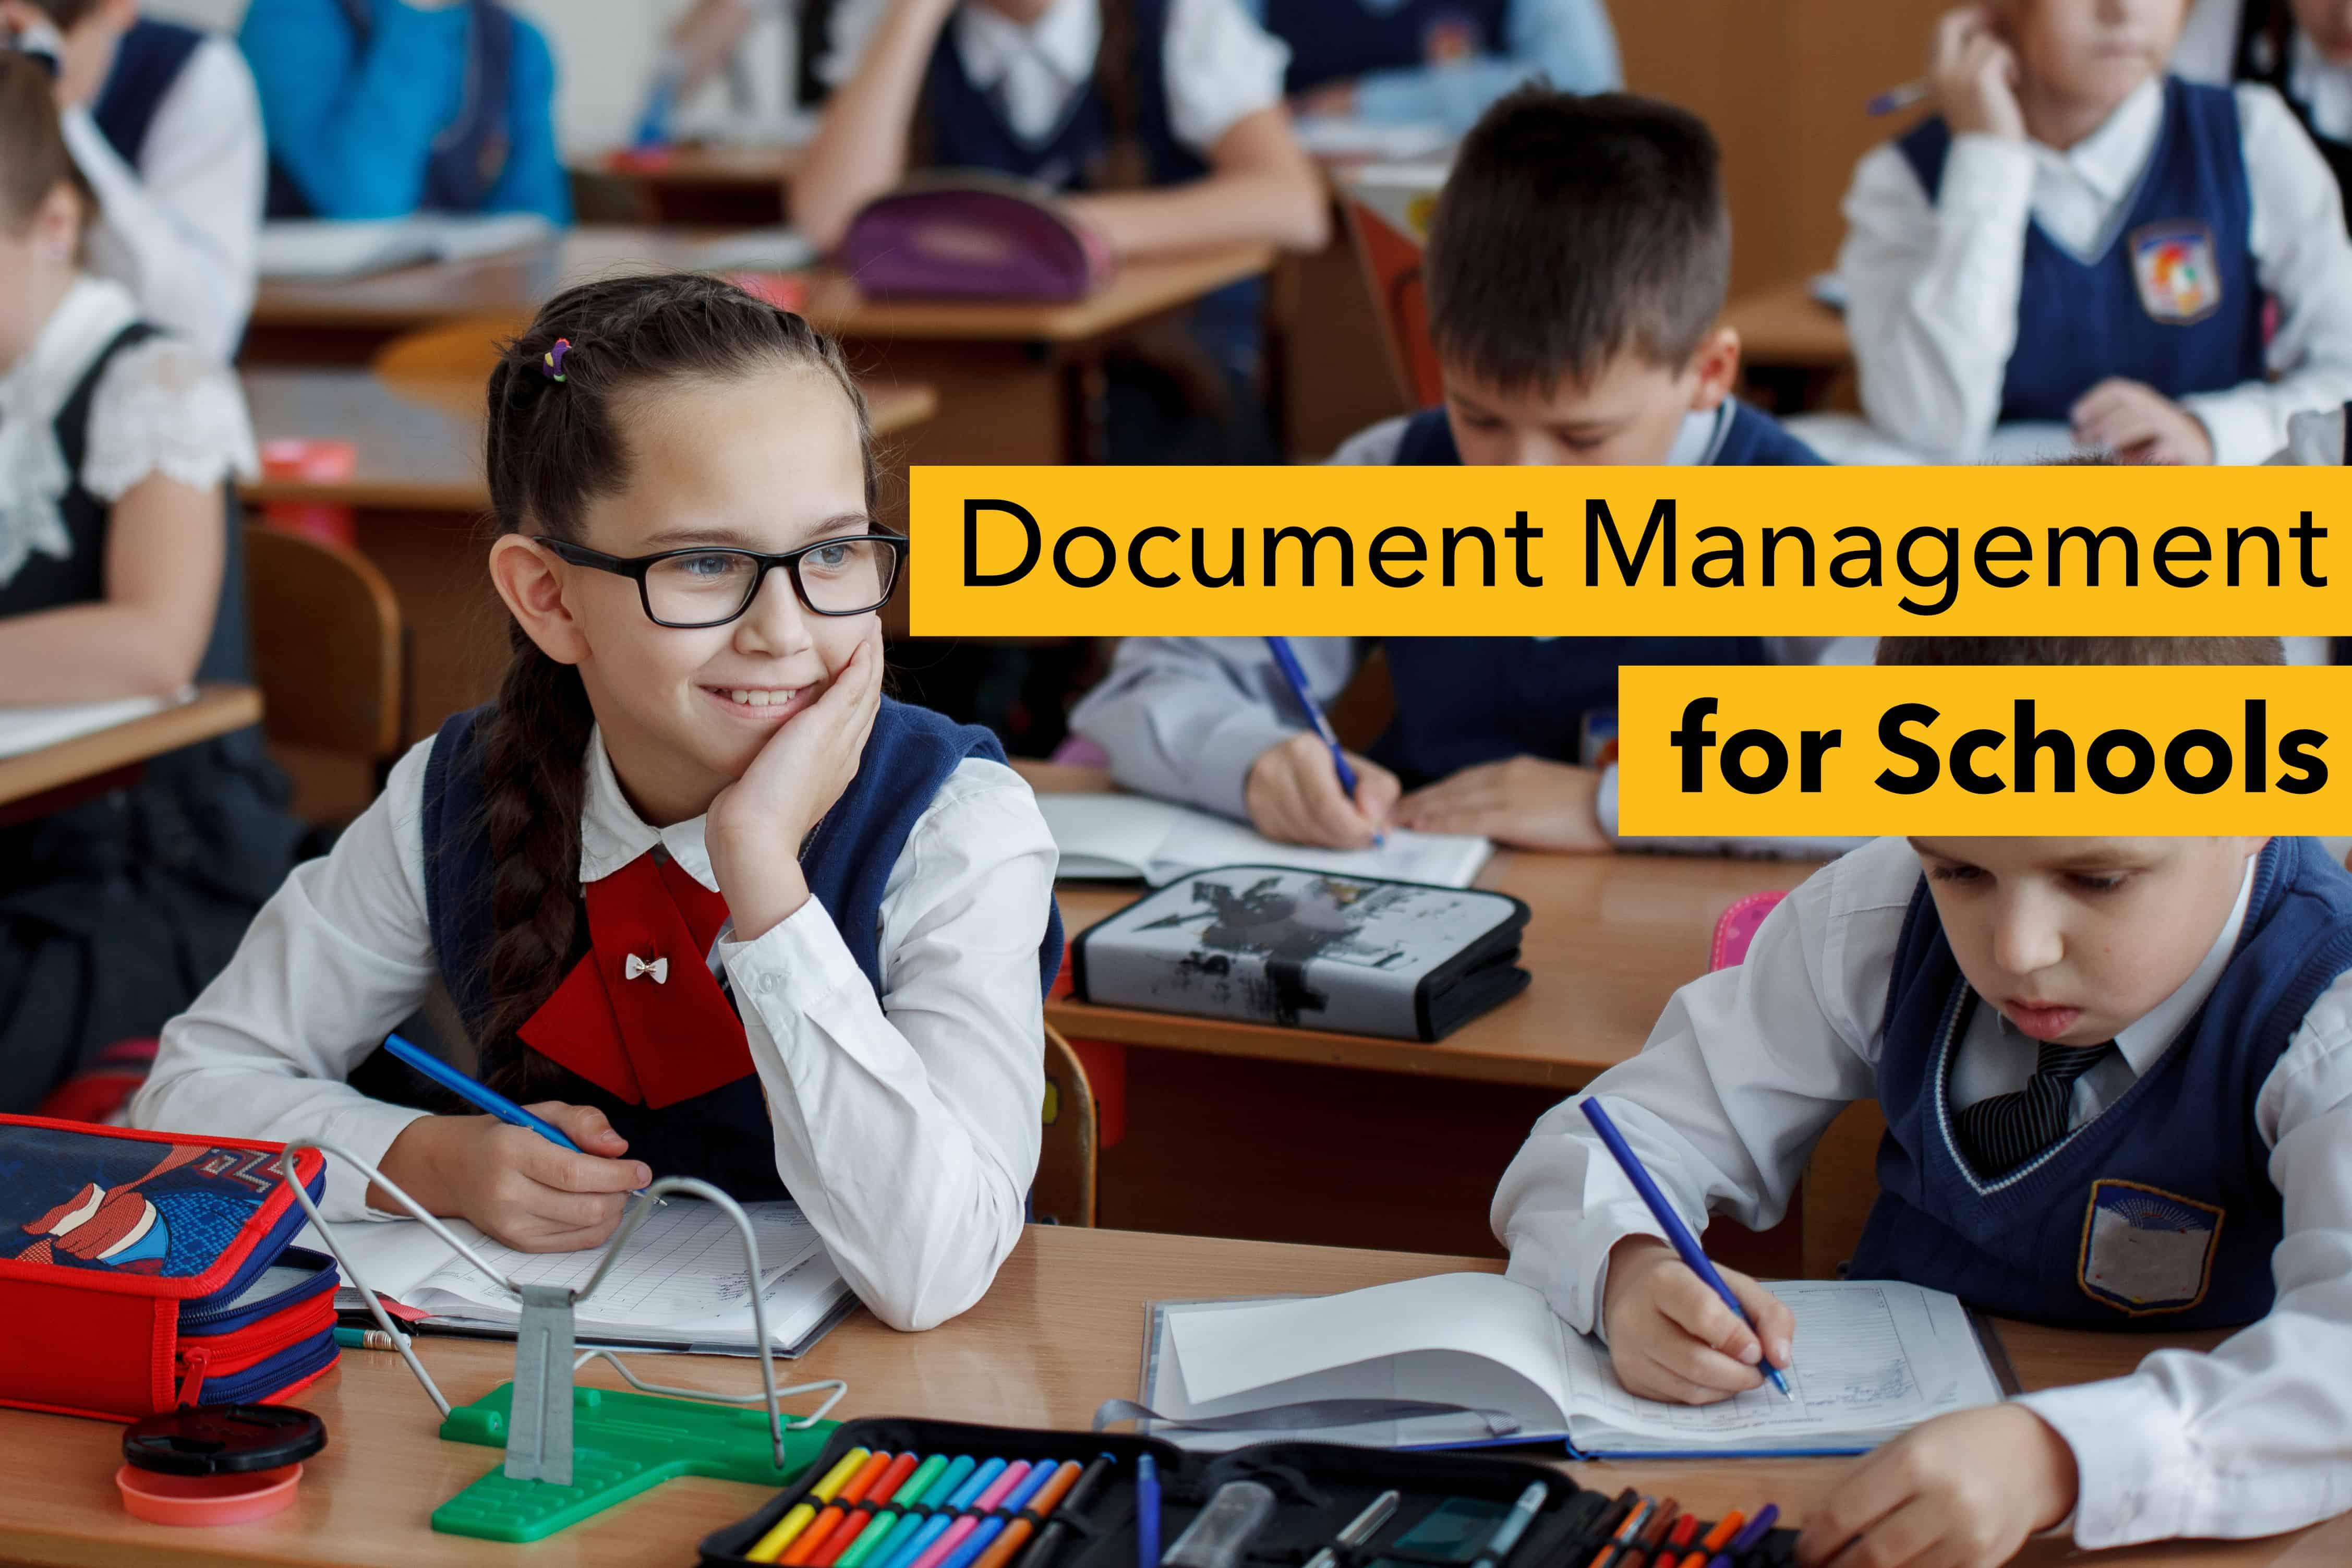 Document management for schools education